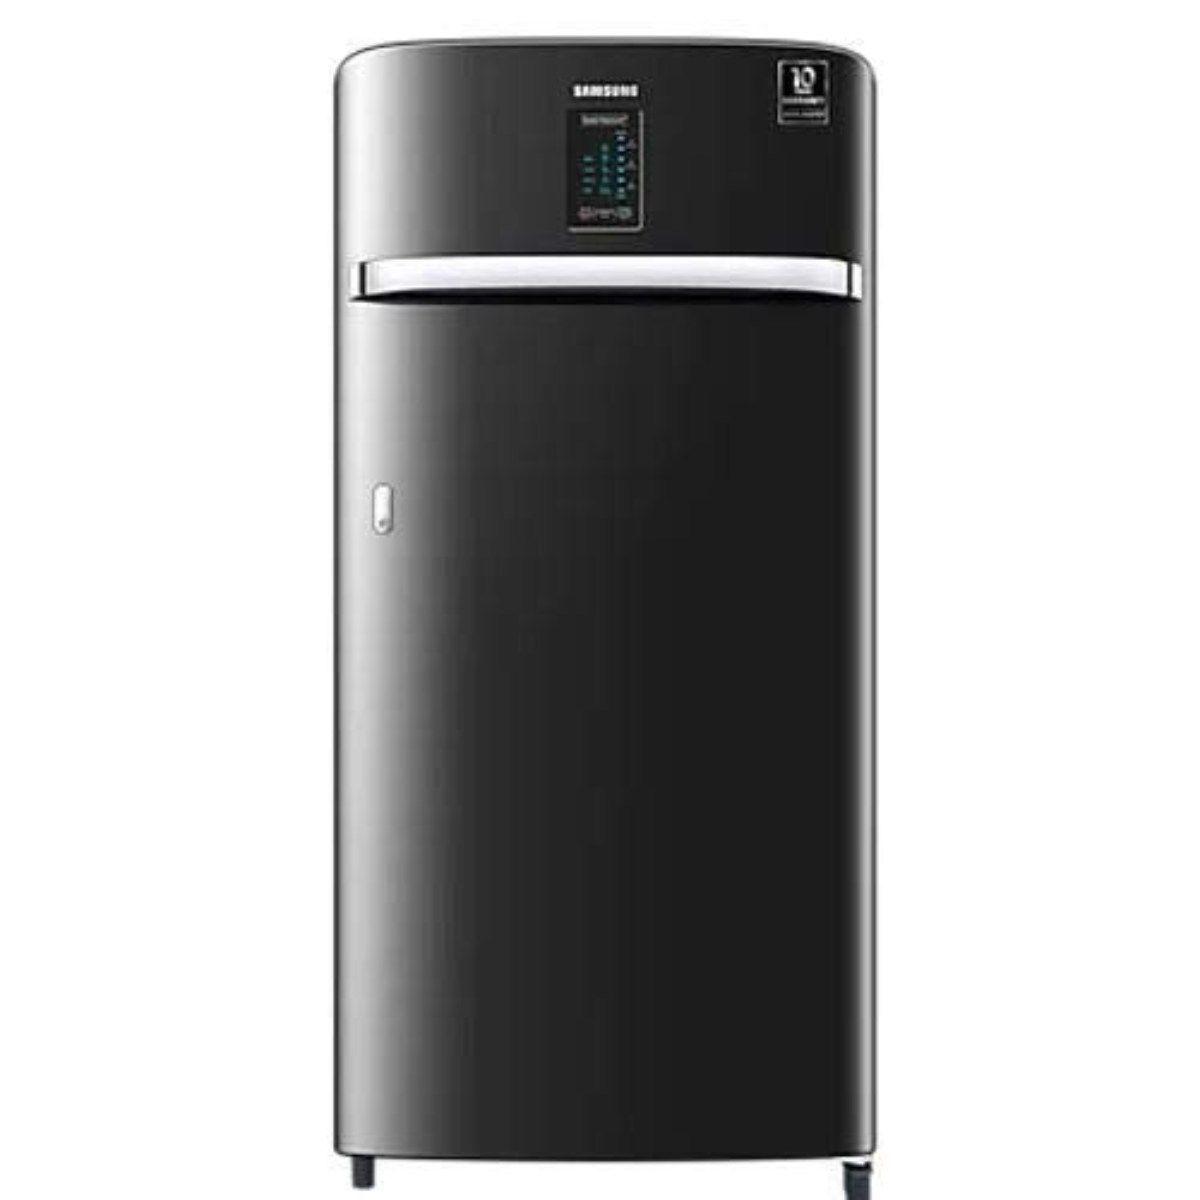 Samsung 192 L 3 Star Inverter Direct cool Single Door Refrigerator(RR21A2J2YBX/HL)